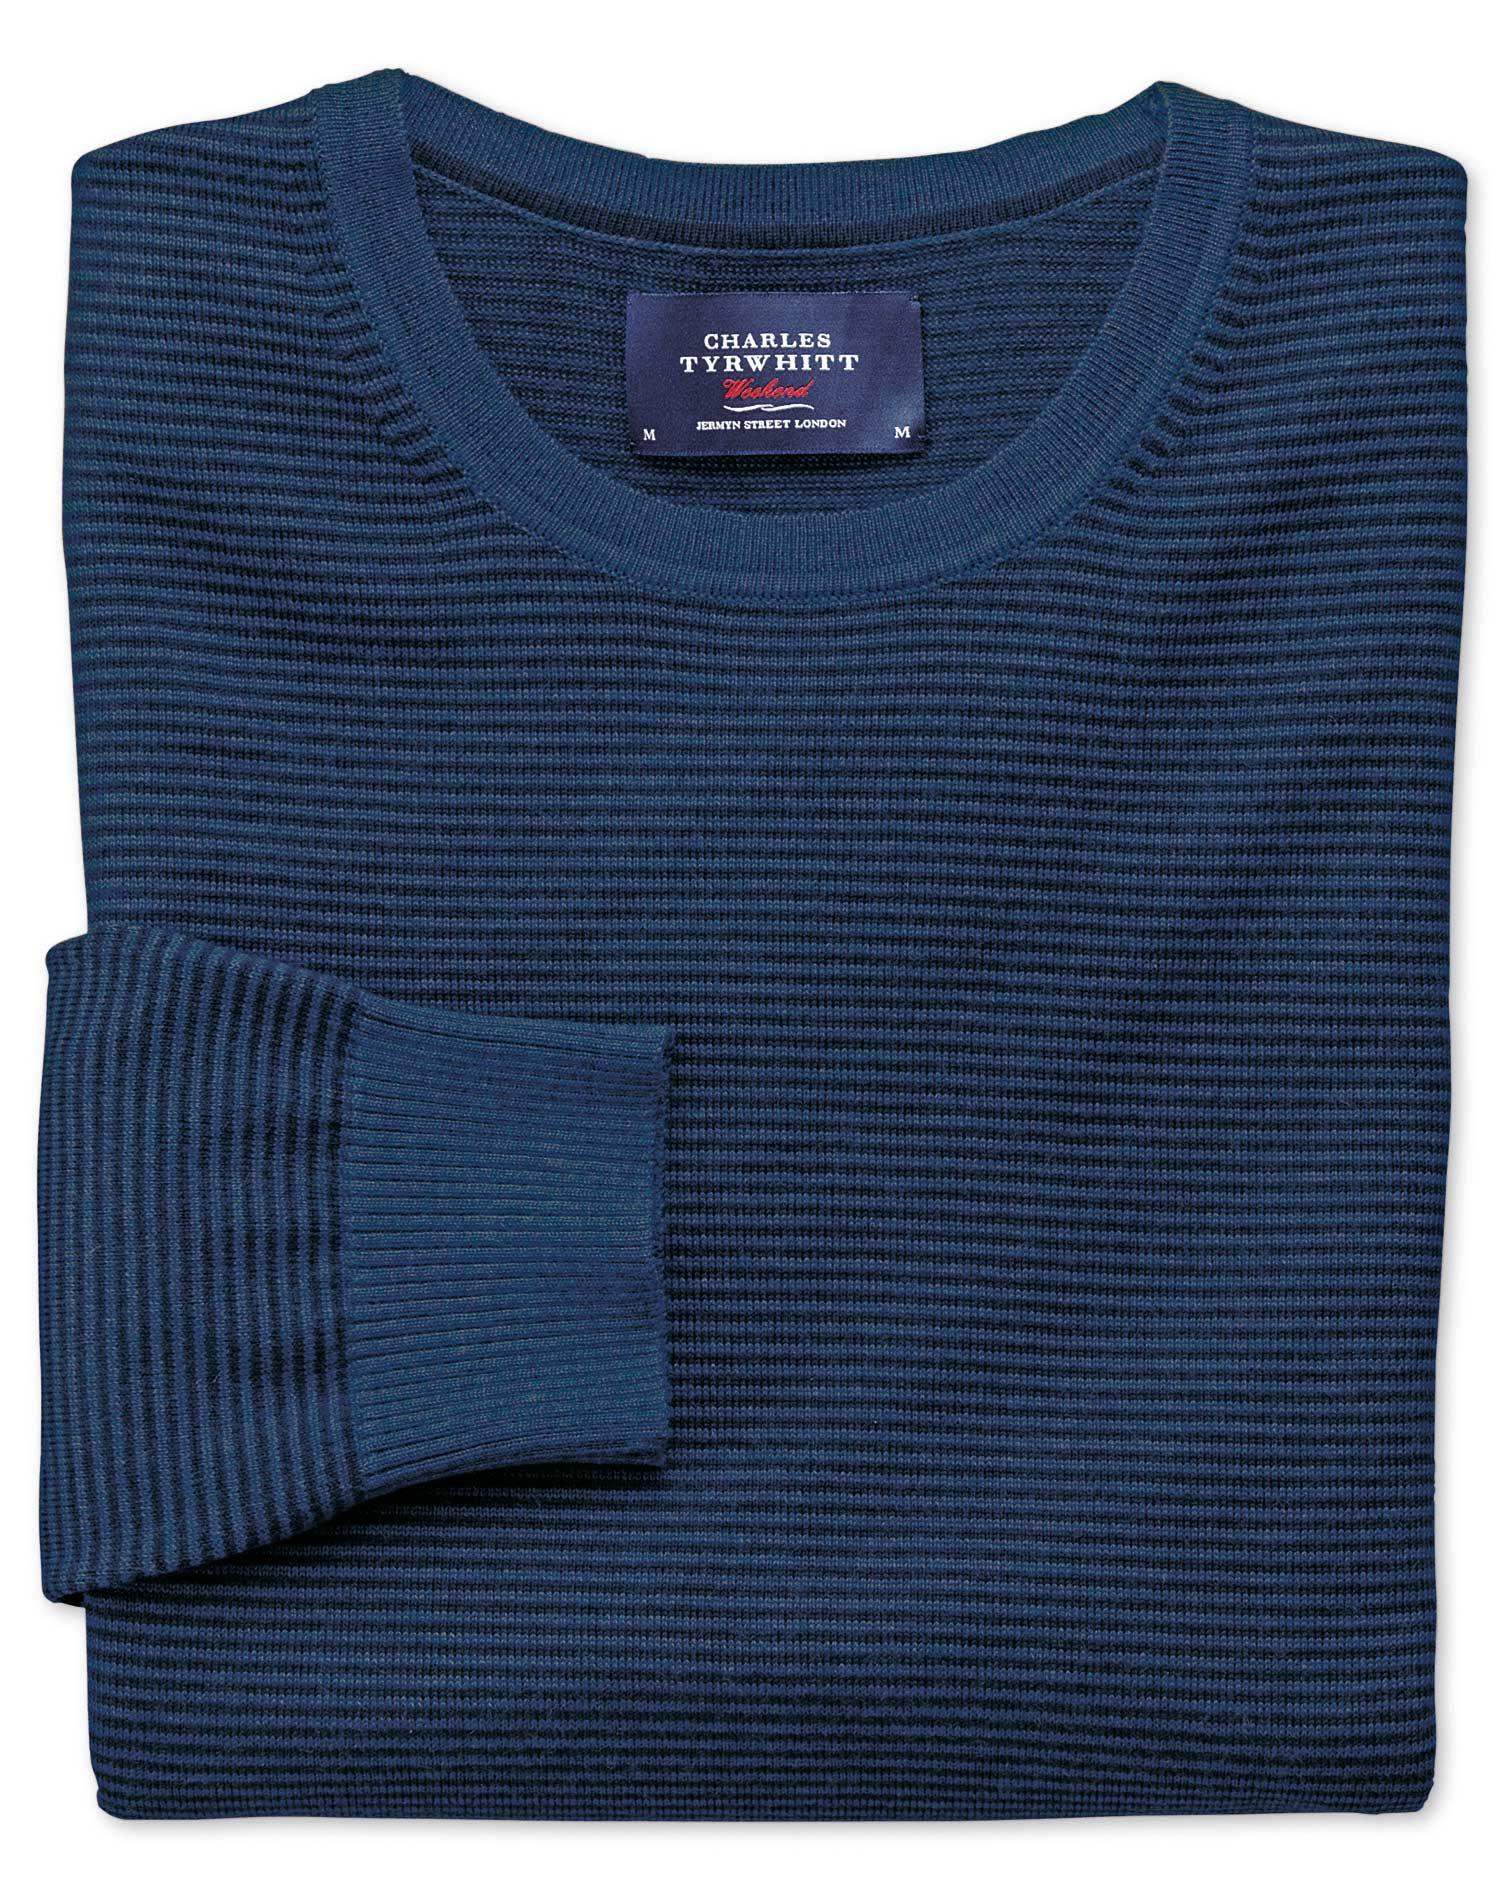 Navy and Blue Merino Wool Crew Neck Jumper Size XXXL by Charles Tyrwhitt